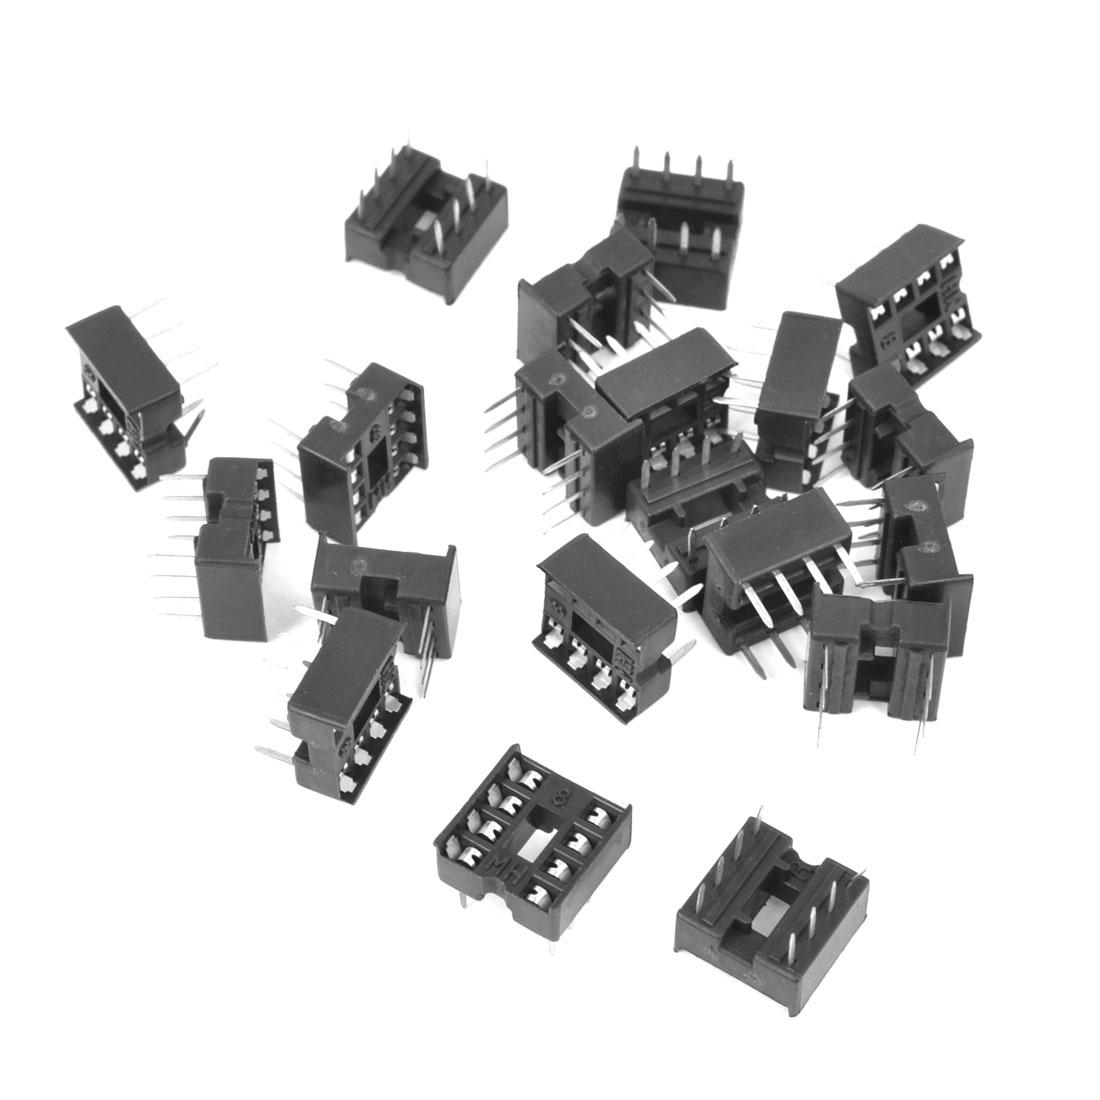 20 Pcs 2.54mm PCB Board 2 Row 8-Pin DIP Solder Type IC Socket Adapter